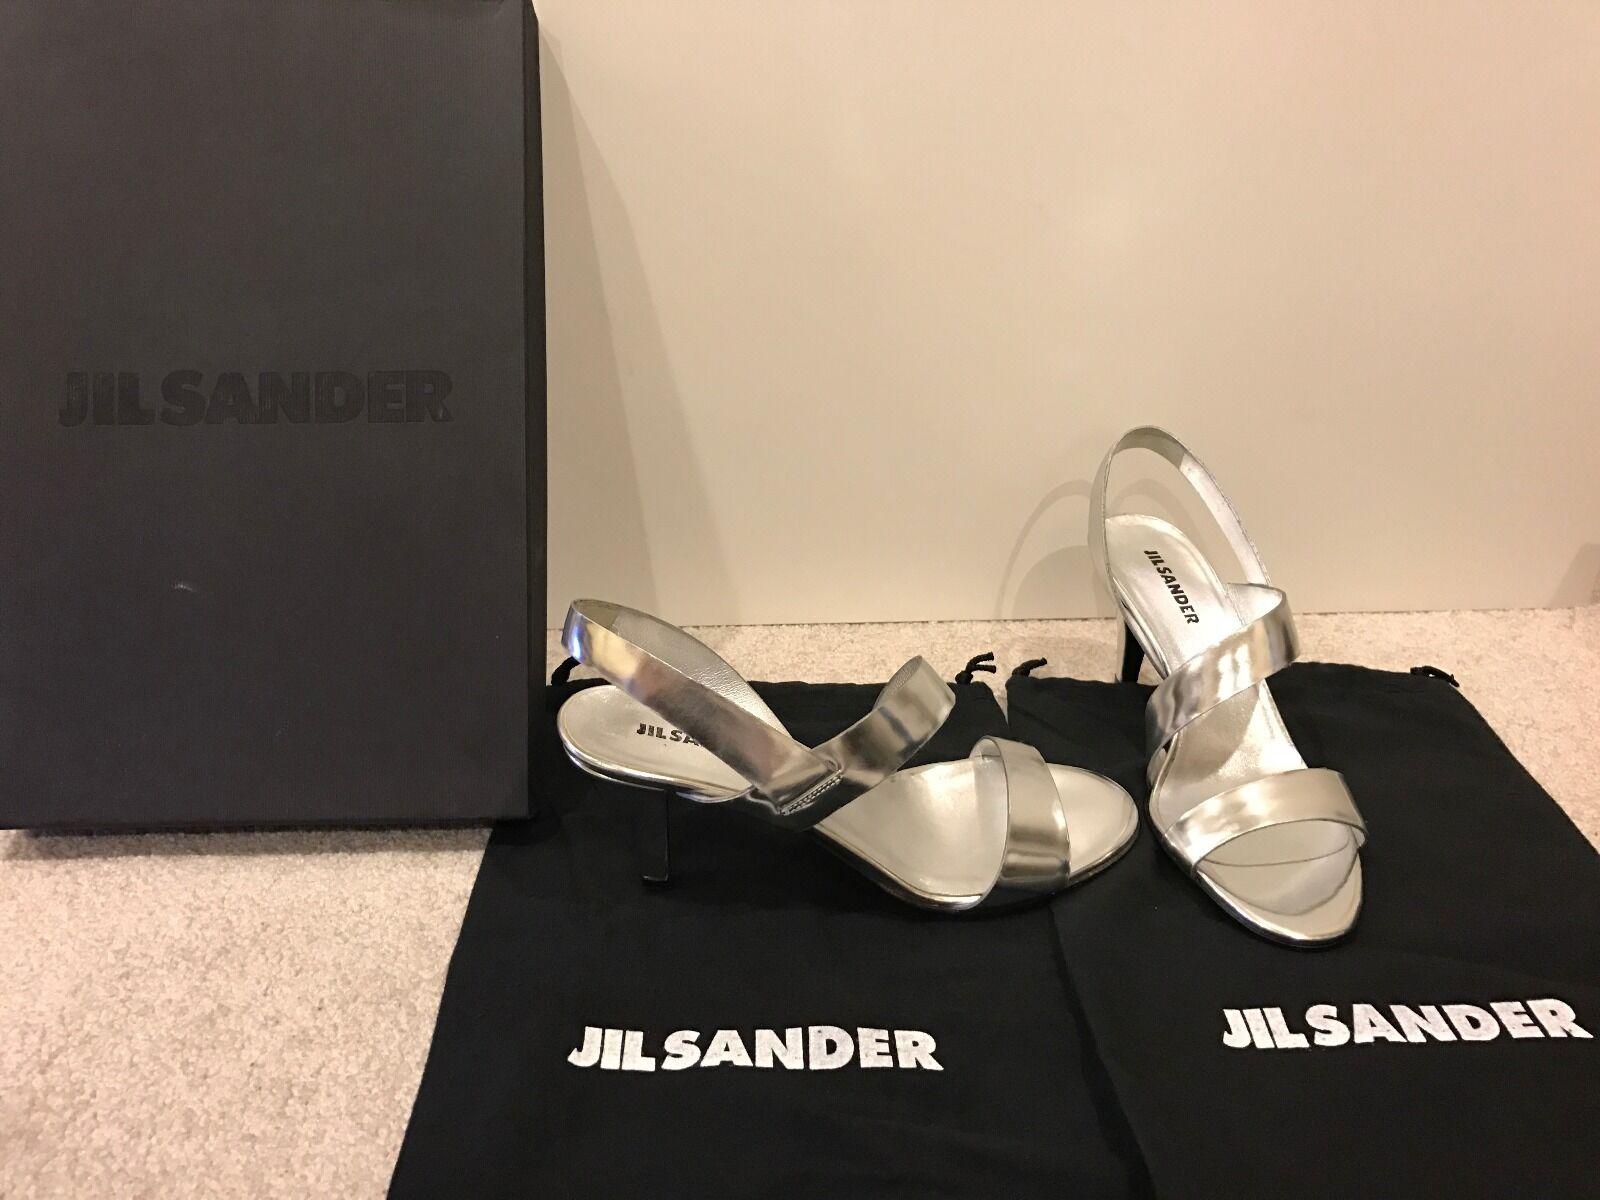 Jil Jil Jil Sander MSRP  390 kvinnor skor Storlek 6  36 Sandals Open Toe klackar  mode galleria